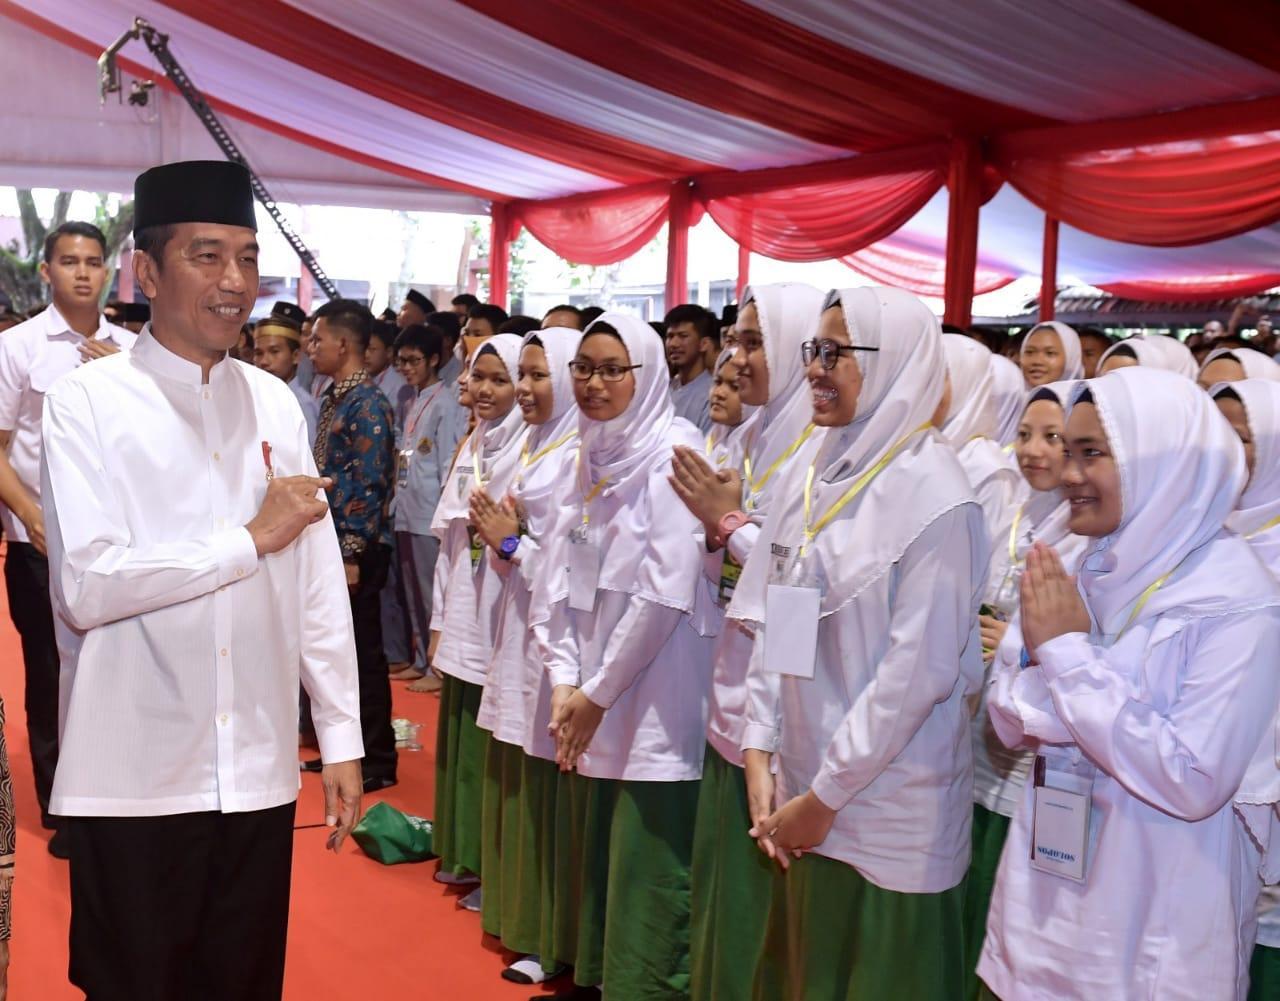 Banyak Lahirkan Tokoh, Presiden Apresiasi Lembaga Pendidikan Muhammadiyah